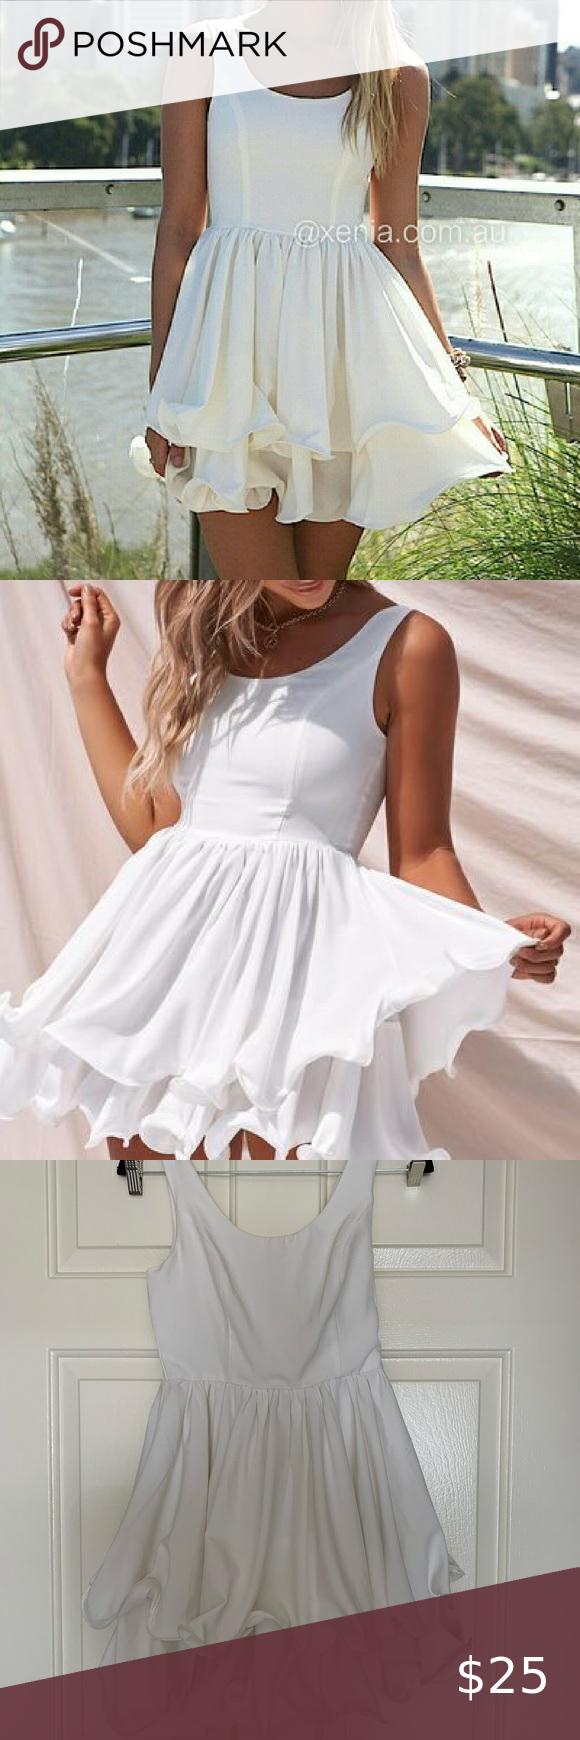 Xenia Boutique White Tiered Ruffle Dress Tiered Ruffle Dress Dresses White Tiered Dress [ 1740 x 580 Pixel ]